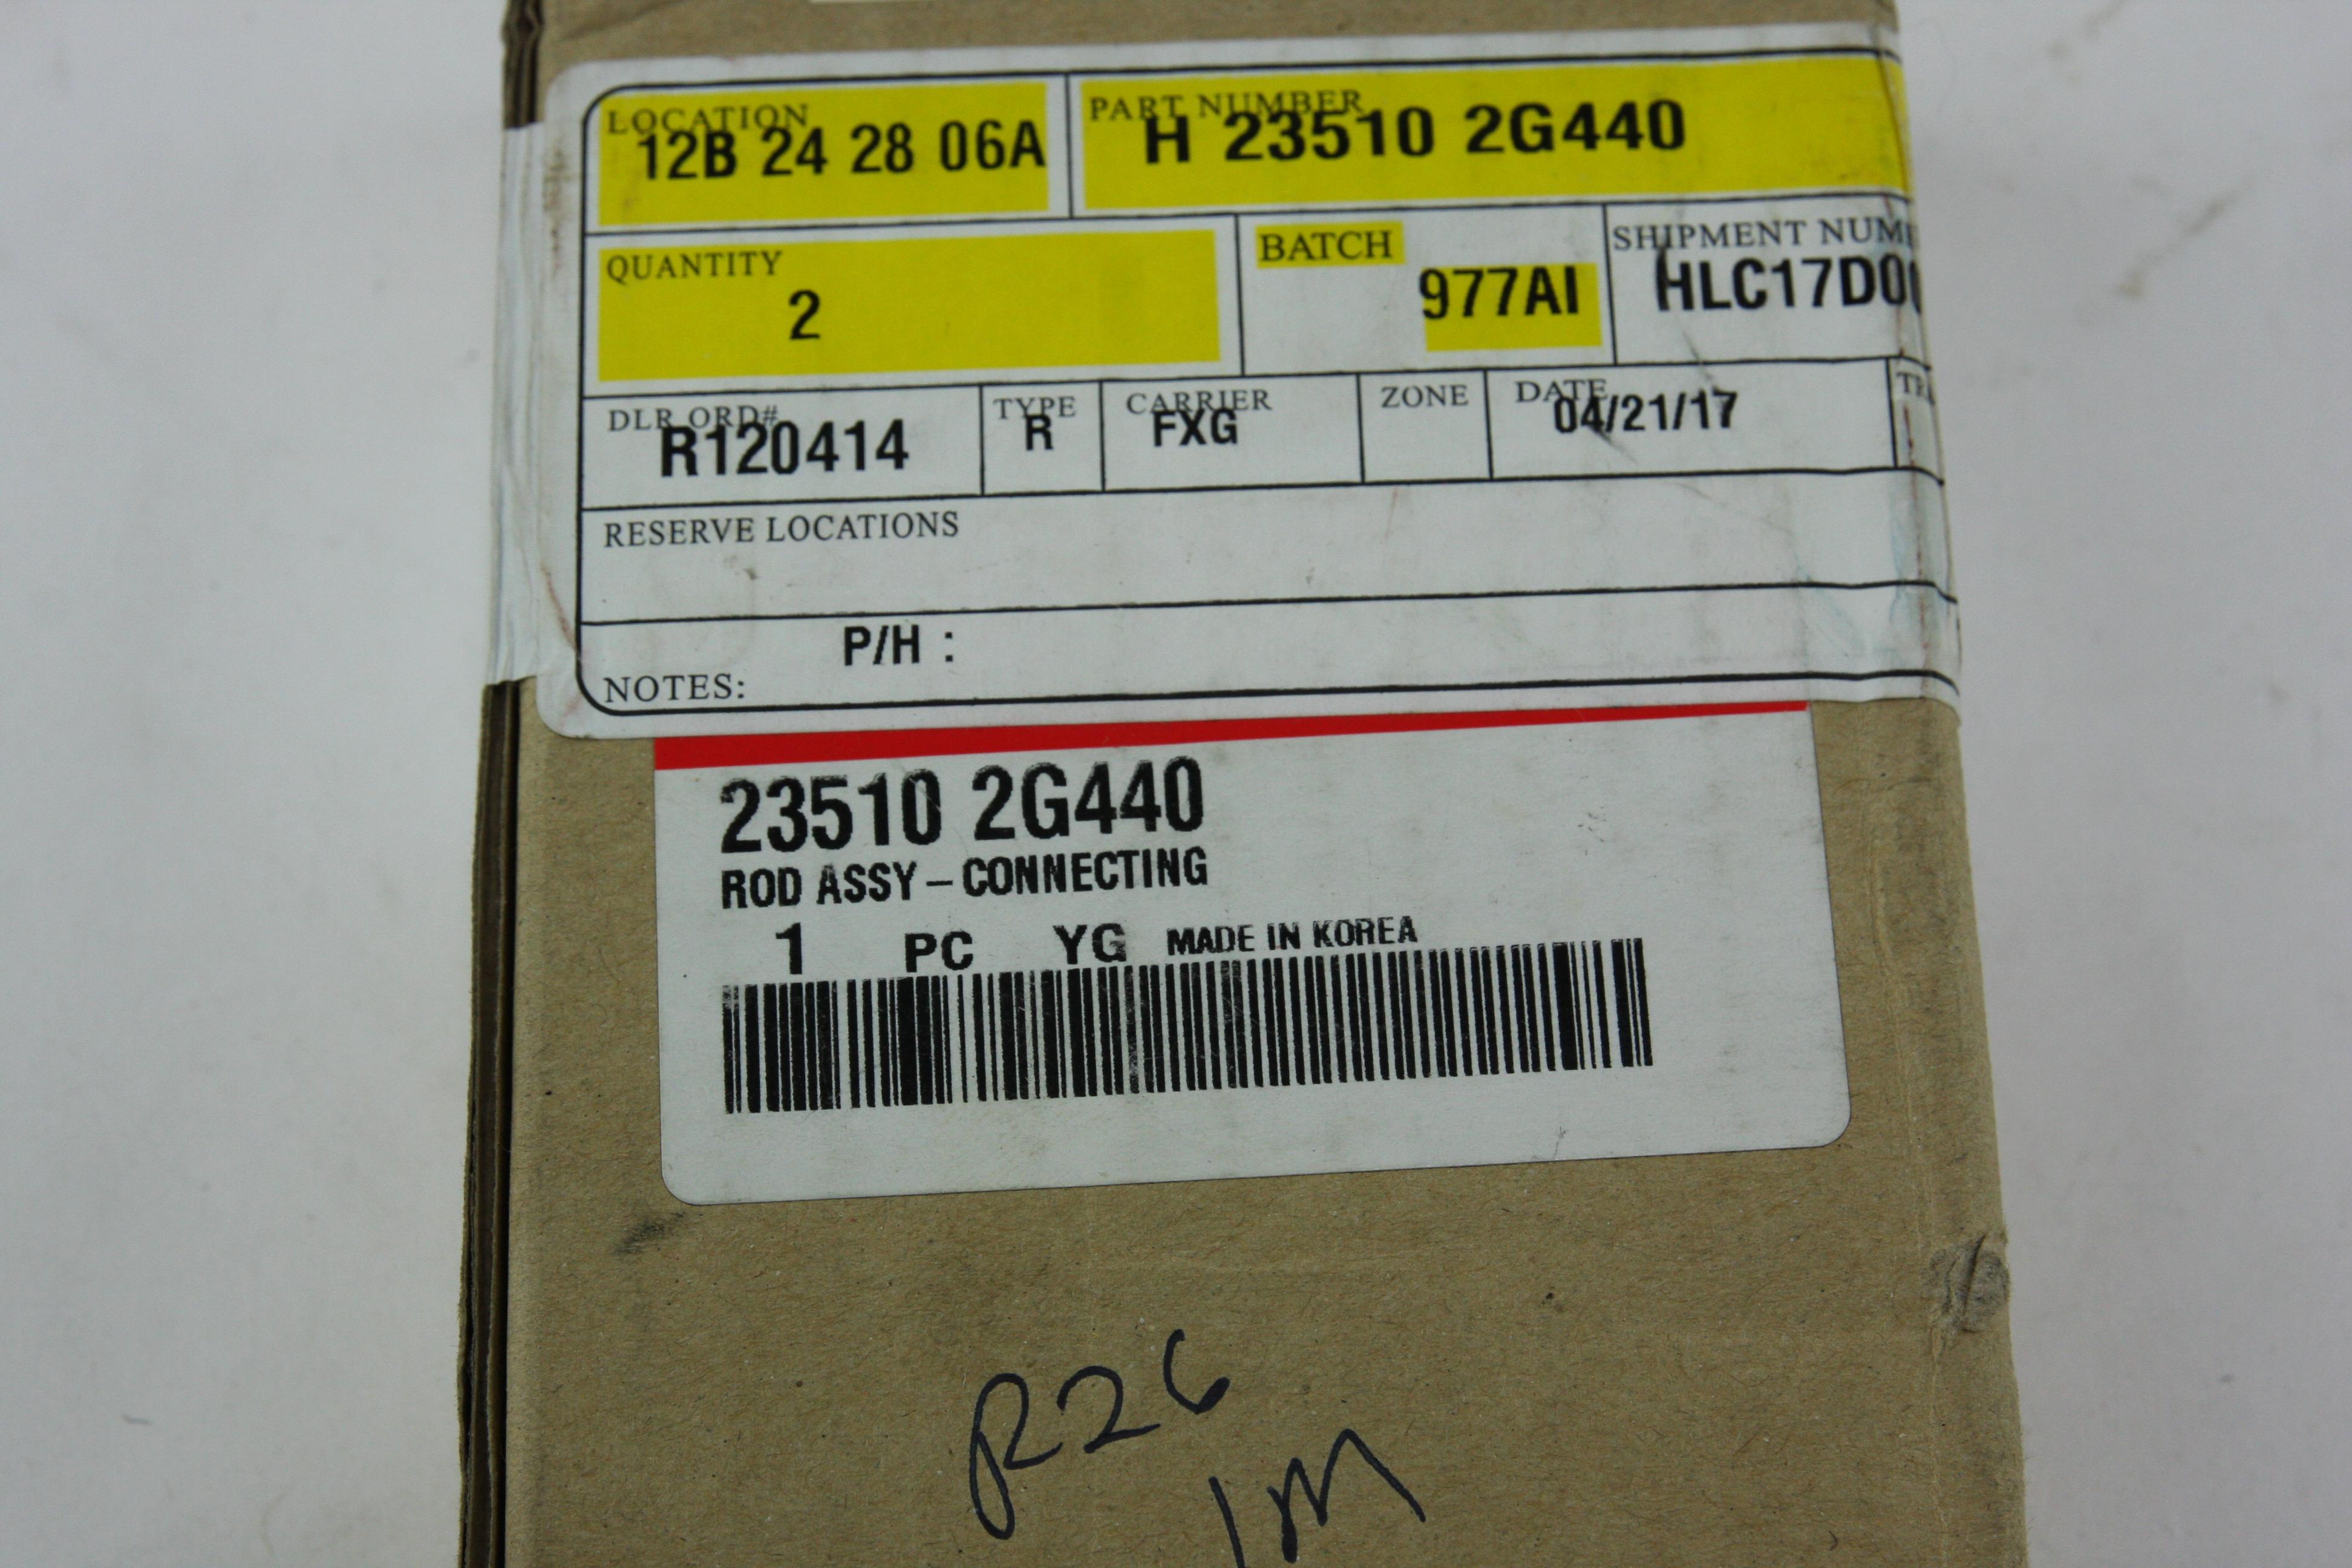 *** New Genuine OEM 235102G440 Kia 13-15 Optima Engine Conrod Connecting Rod - image 3